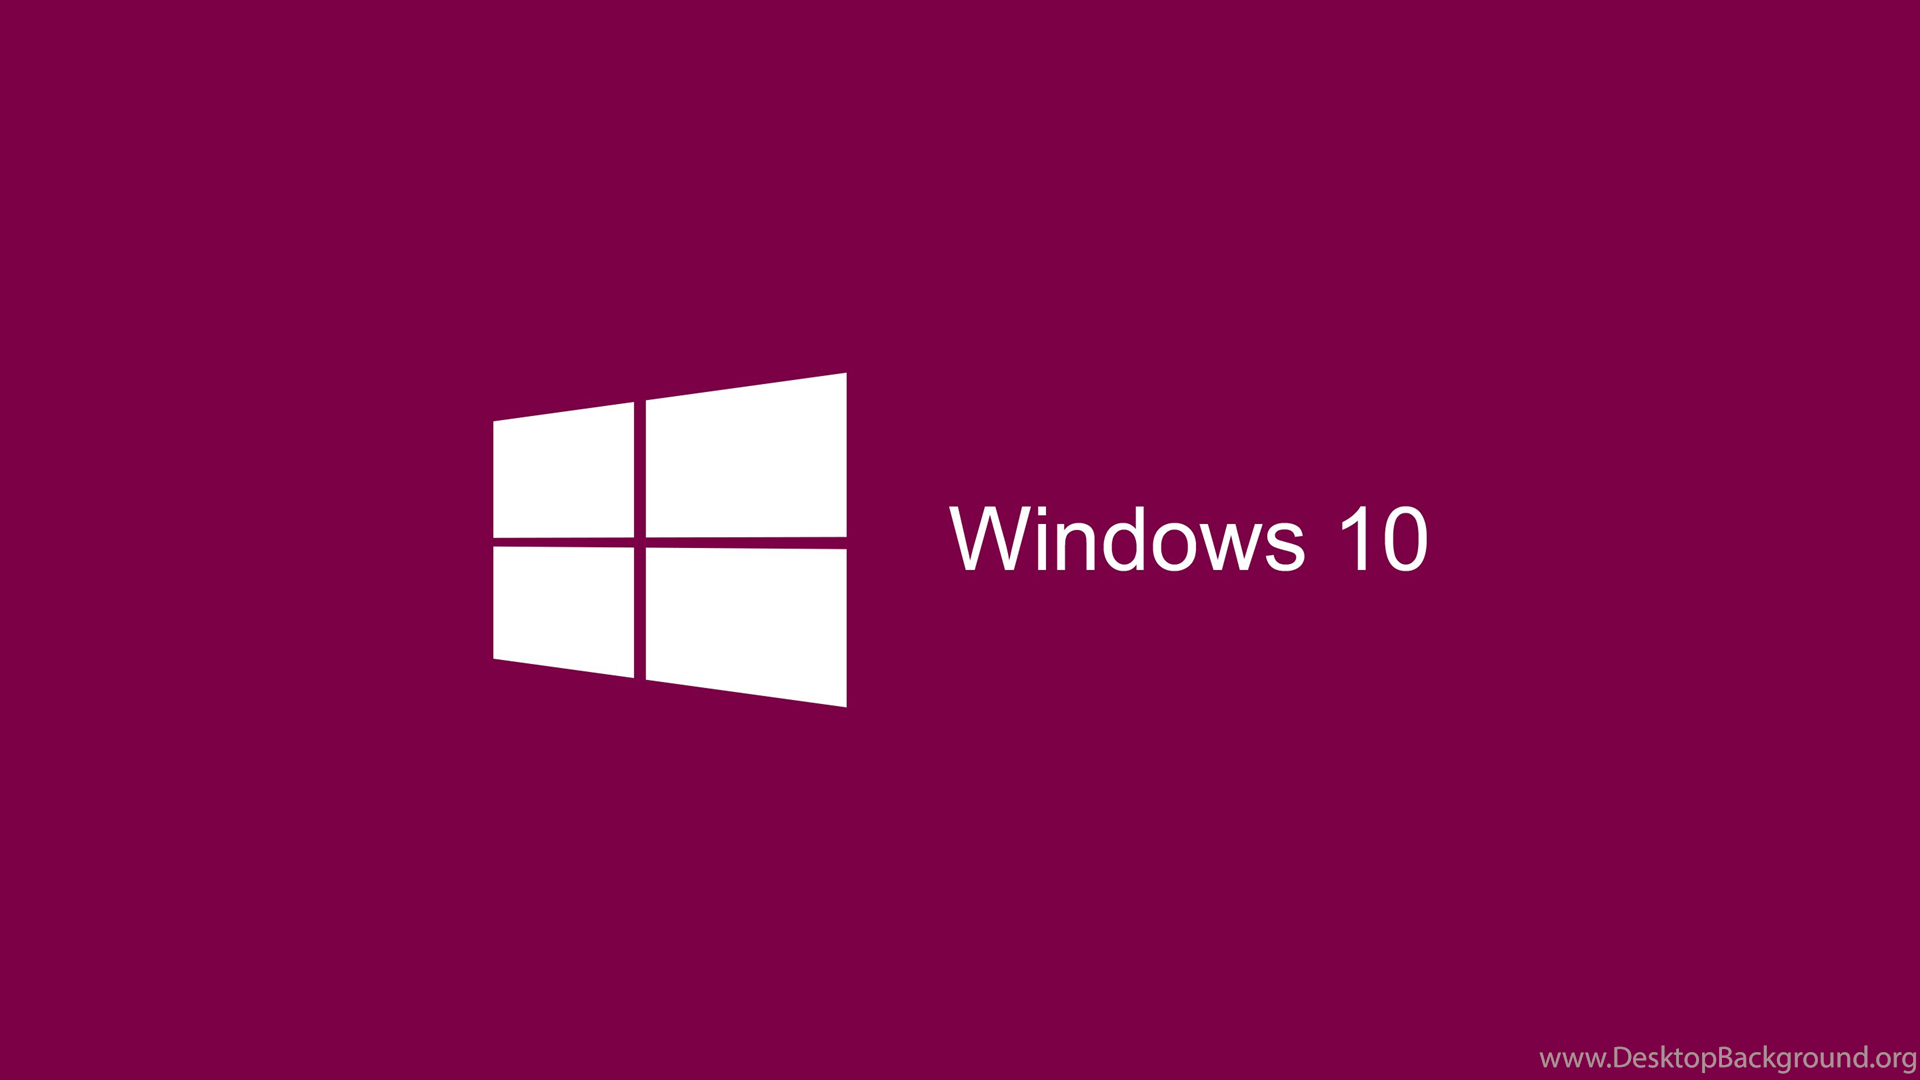 Windows 10 Full Hd Wallpapers Free Download Desktop Background